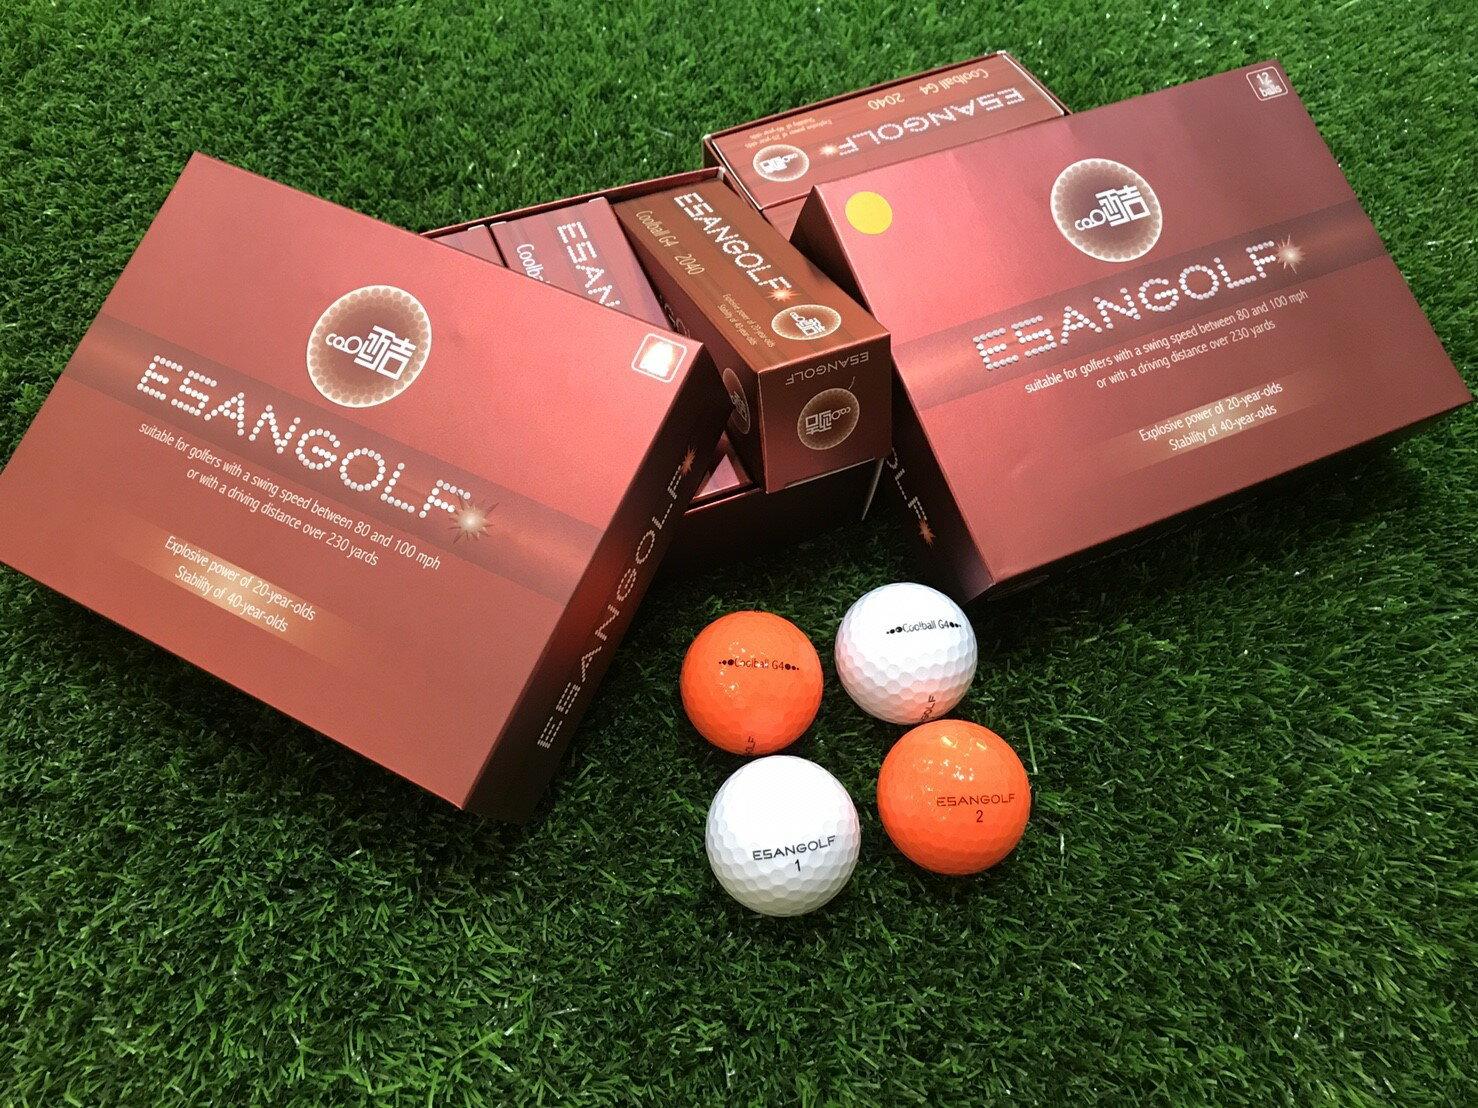 Coolball G4 2040 高爾夫球 ( 一盒裝12入 ) 白色、橘色